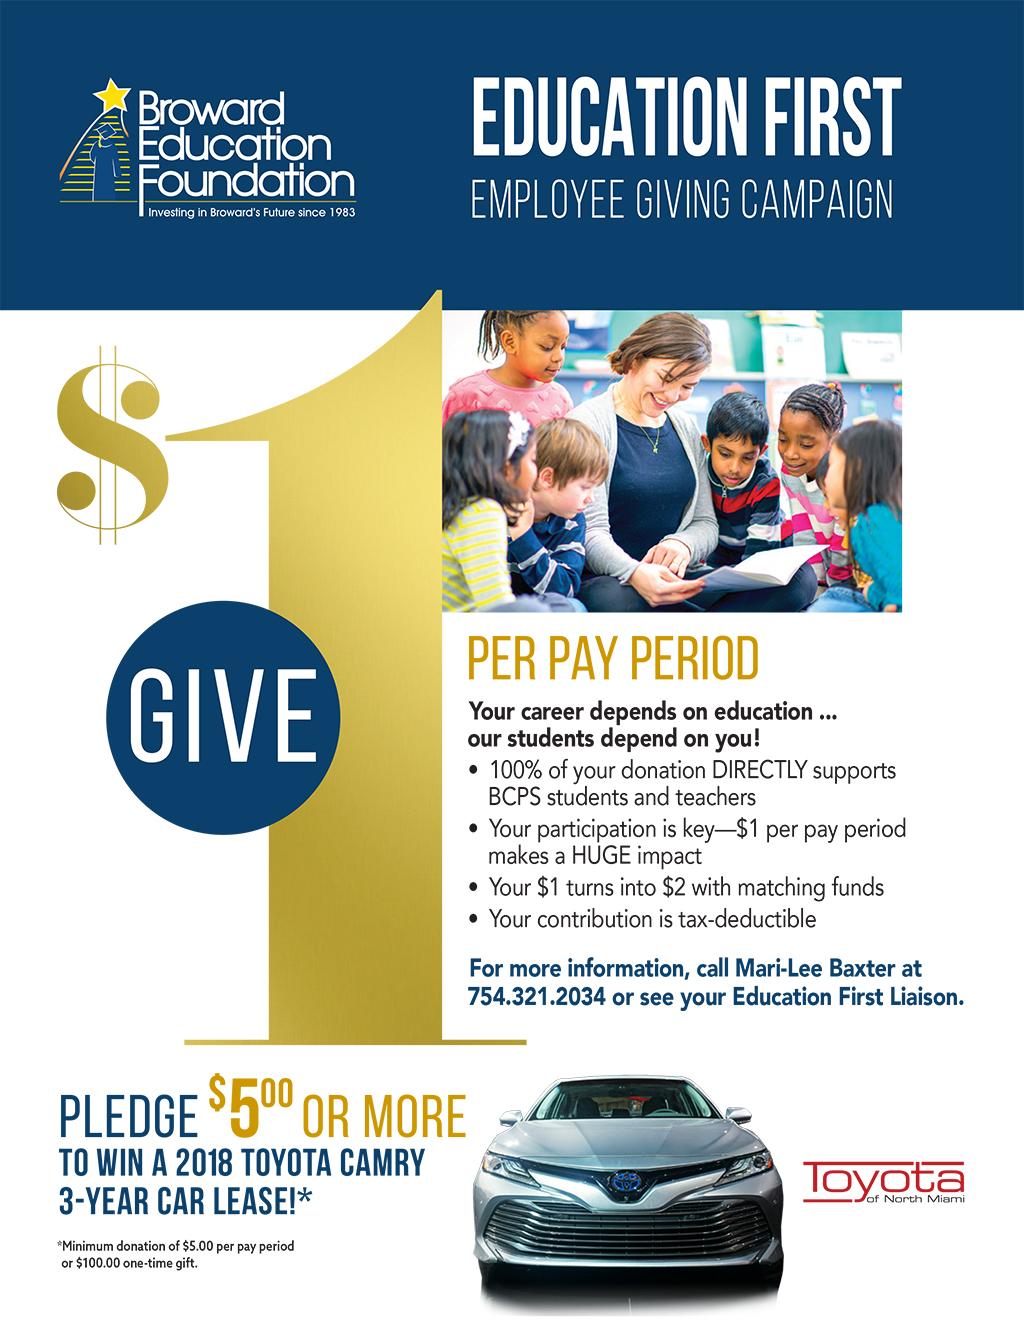 2017 Donate to Win